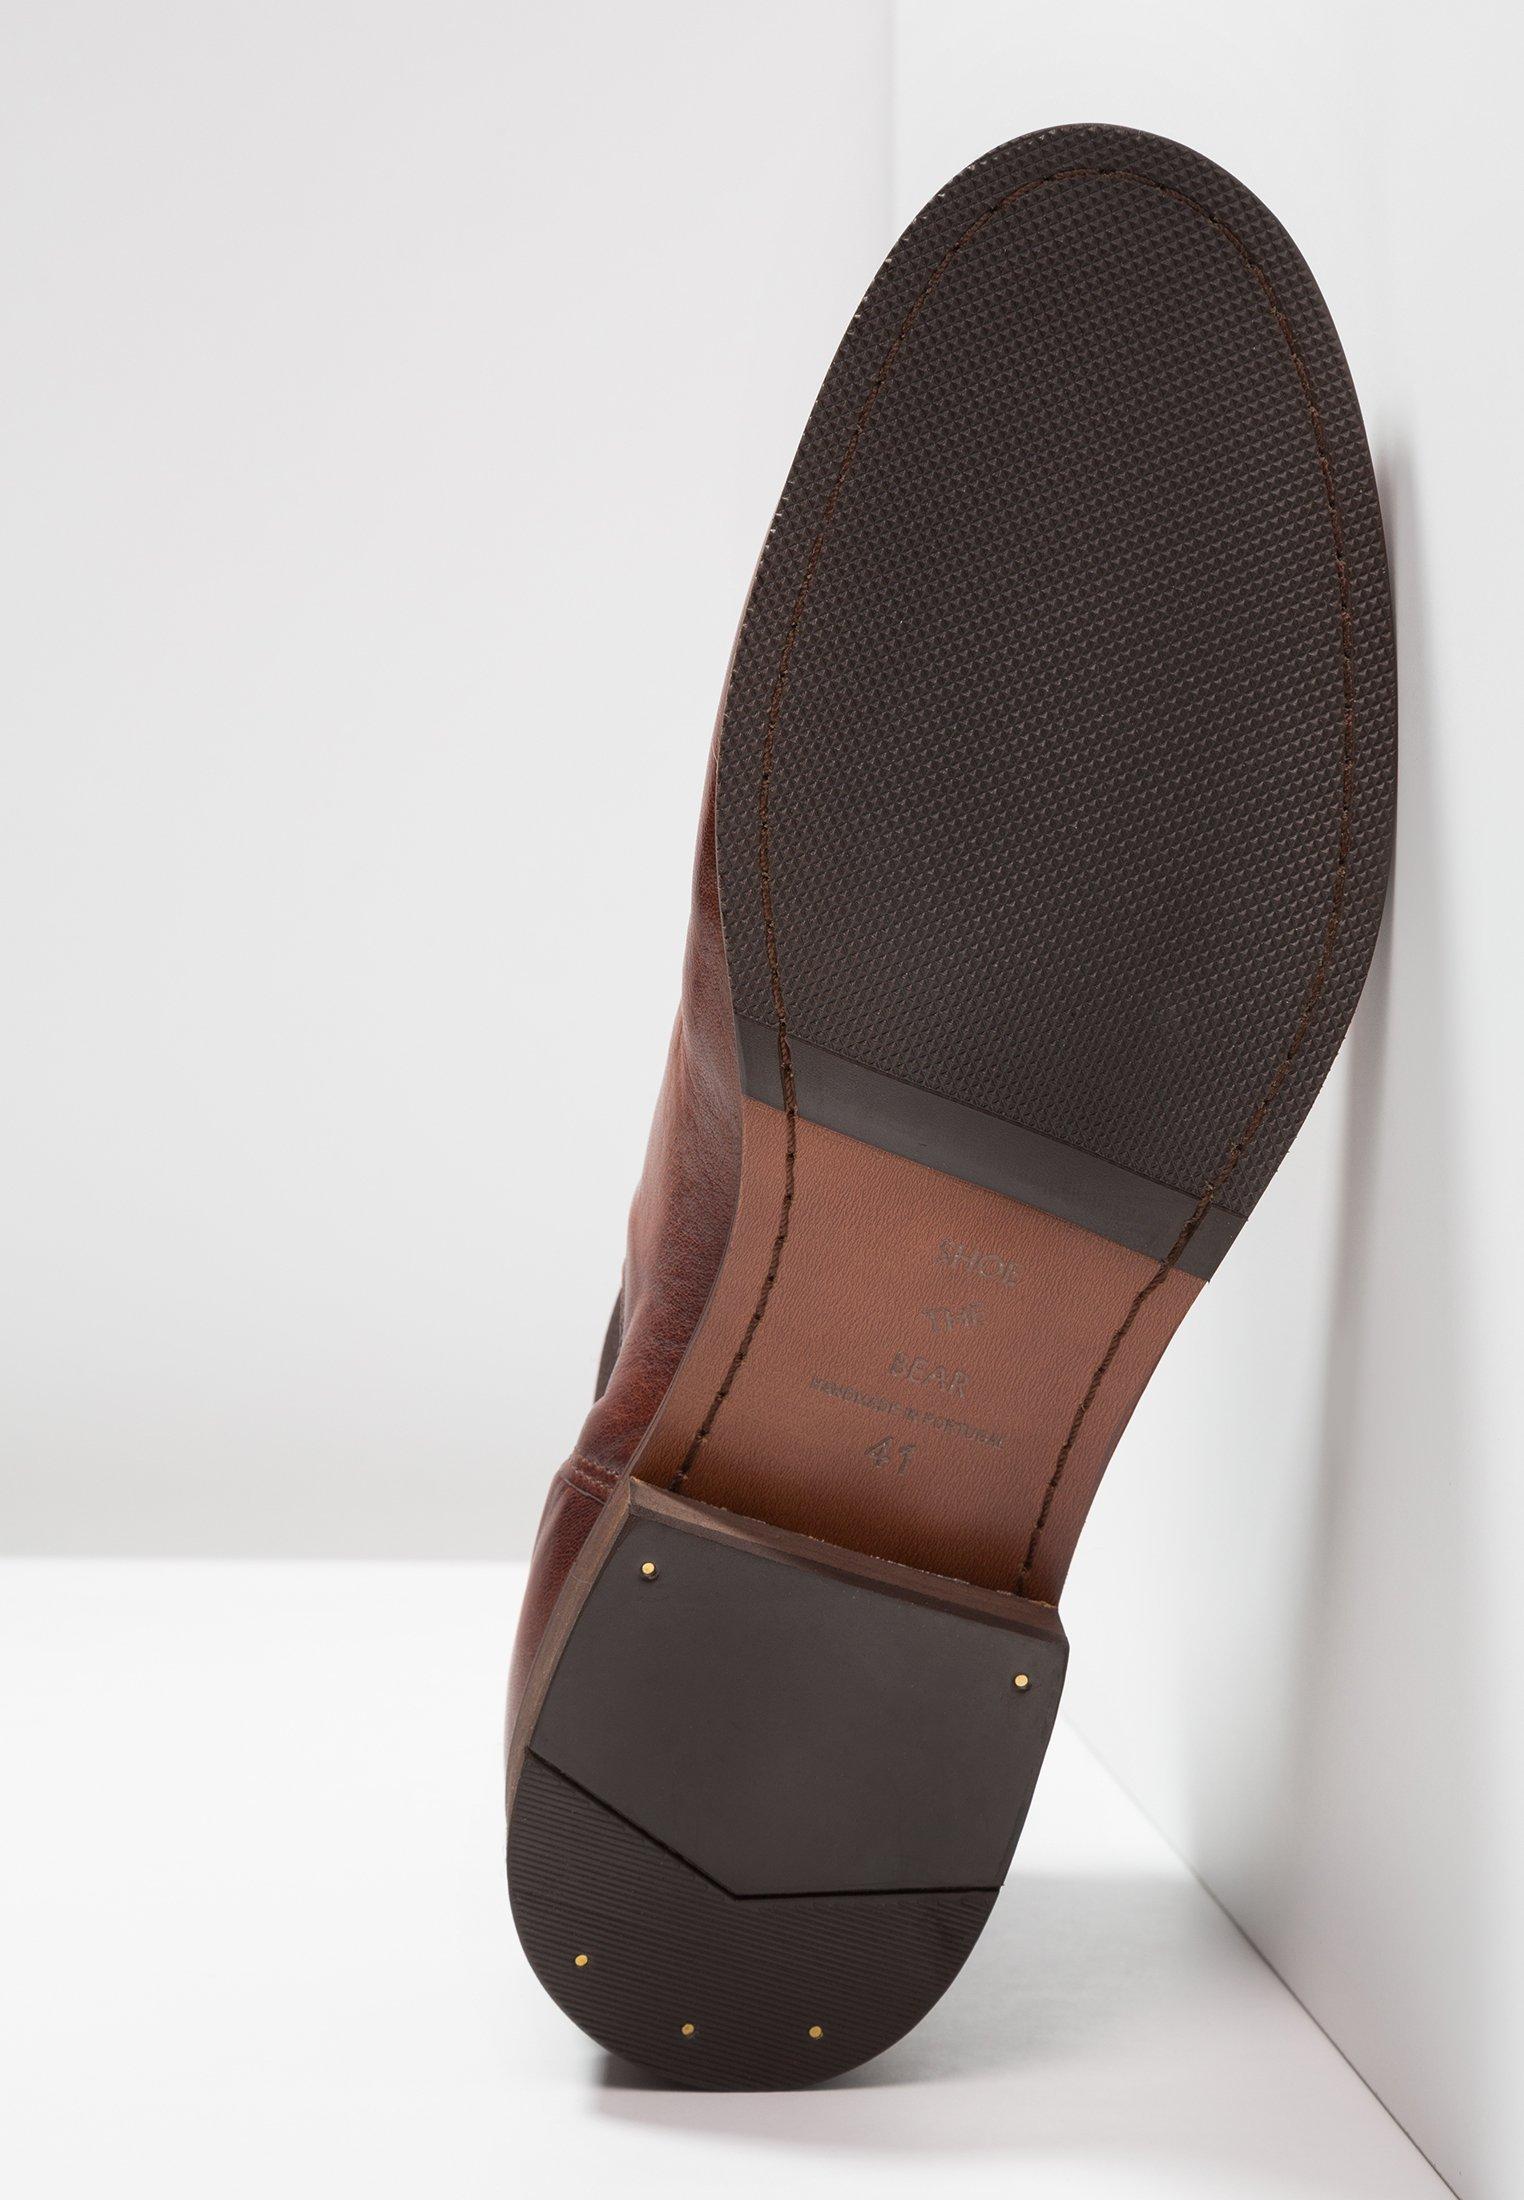 Shoe The ArnieStivaletti Brown The Shoe Bear 5L3RAj4